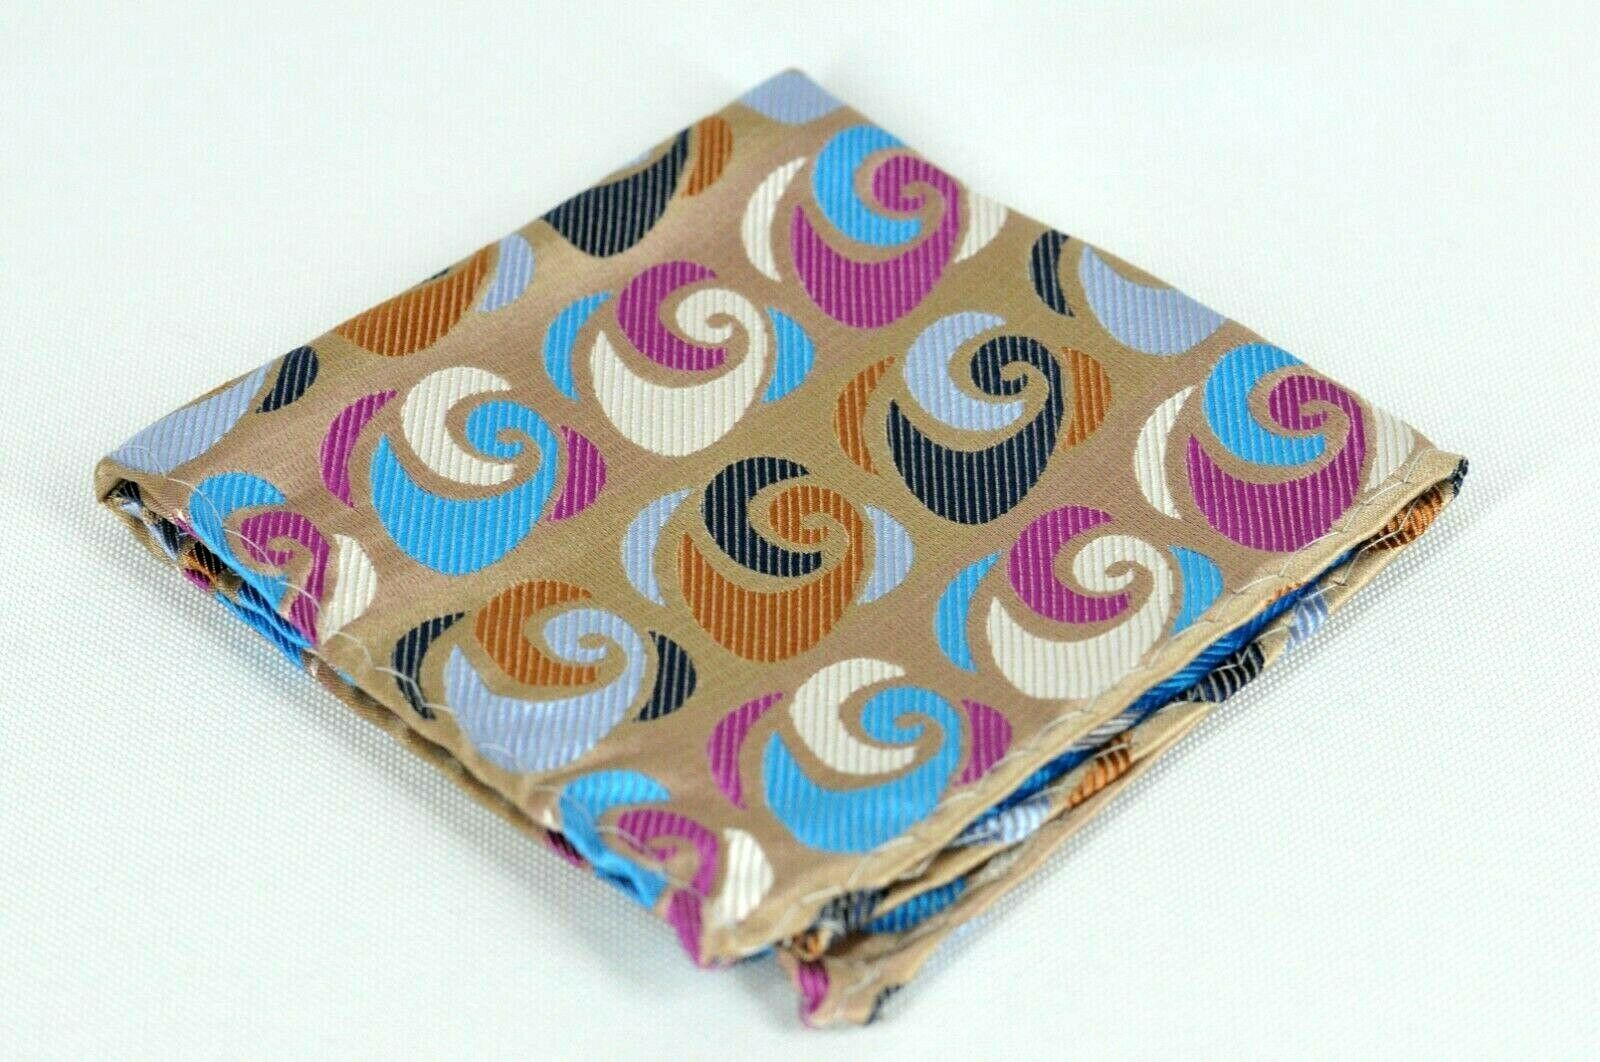 Lord R Colton Masterworks Argos Taupe & Purple Geo Silk Pocket Square - New